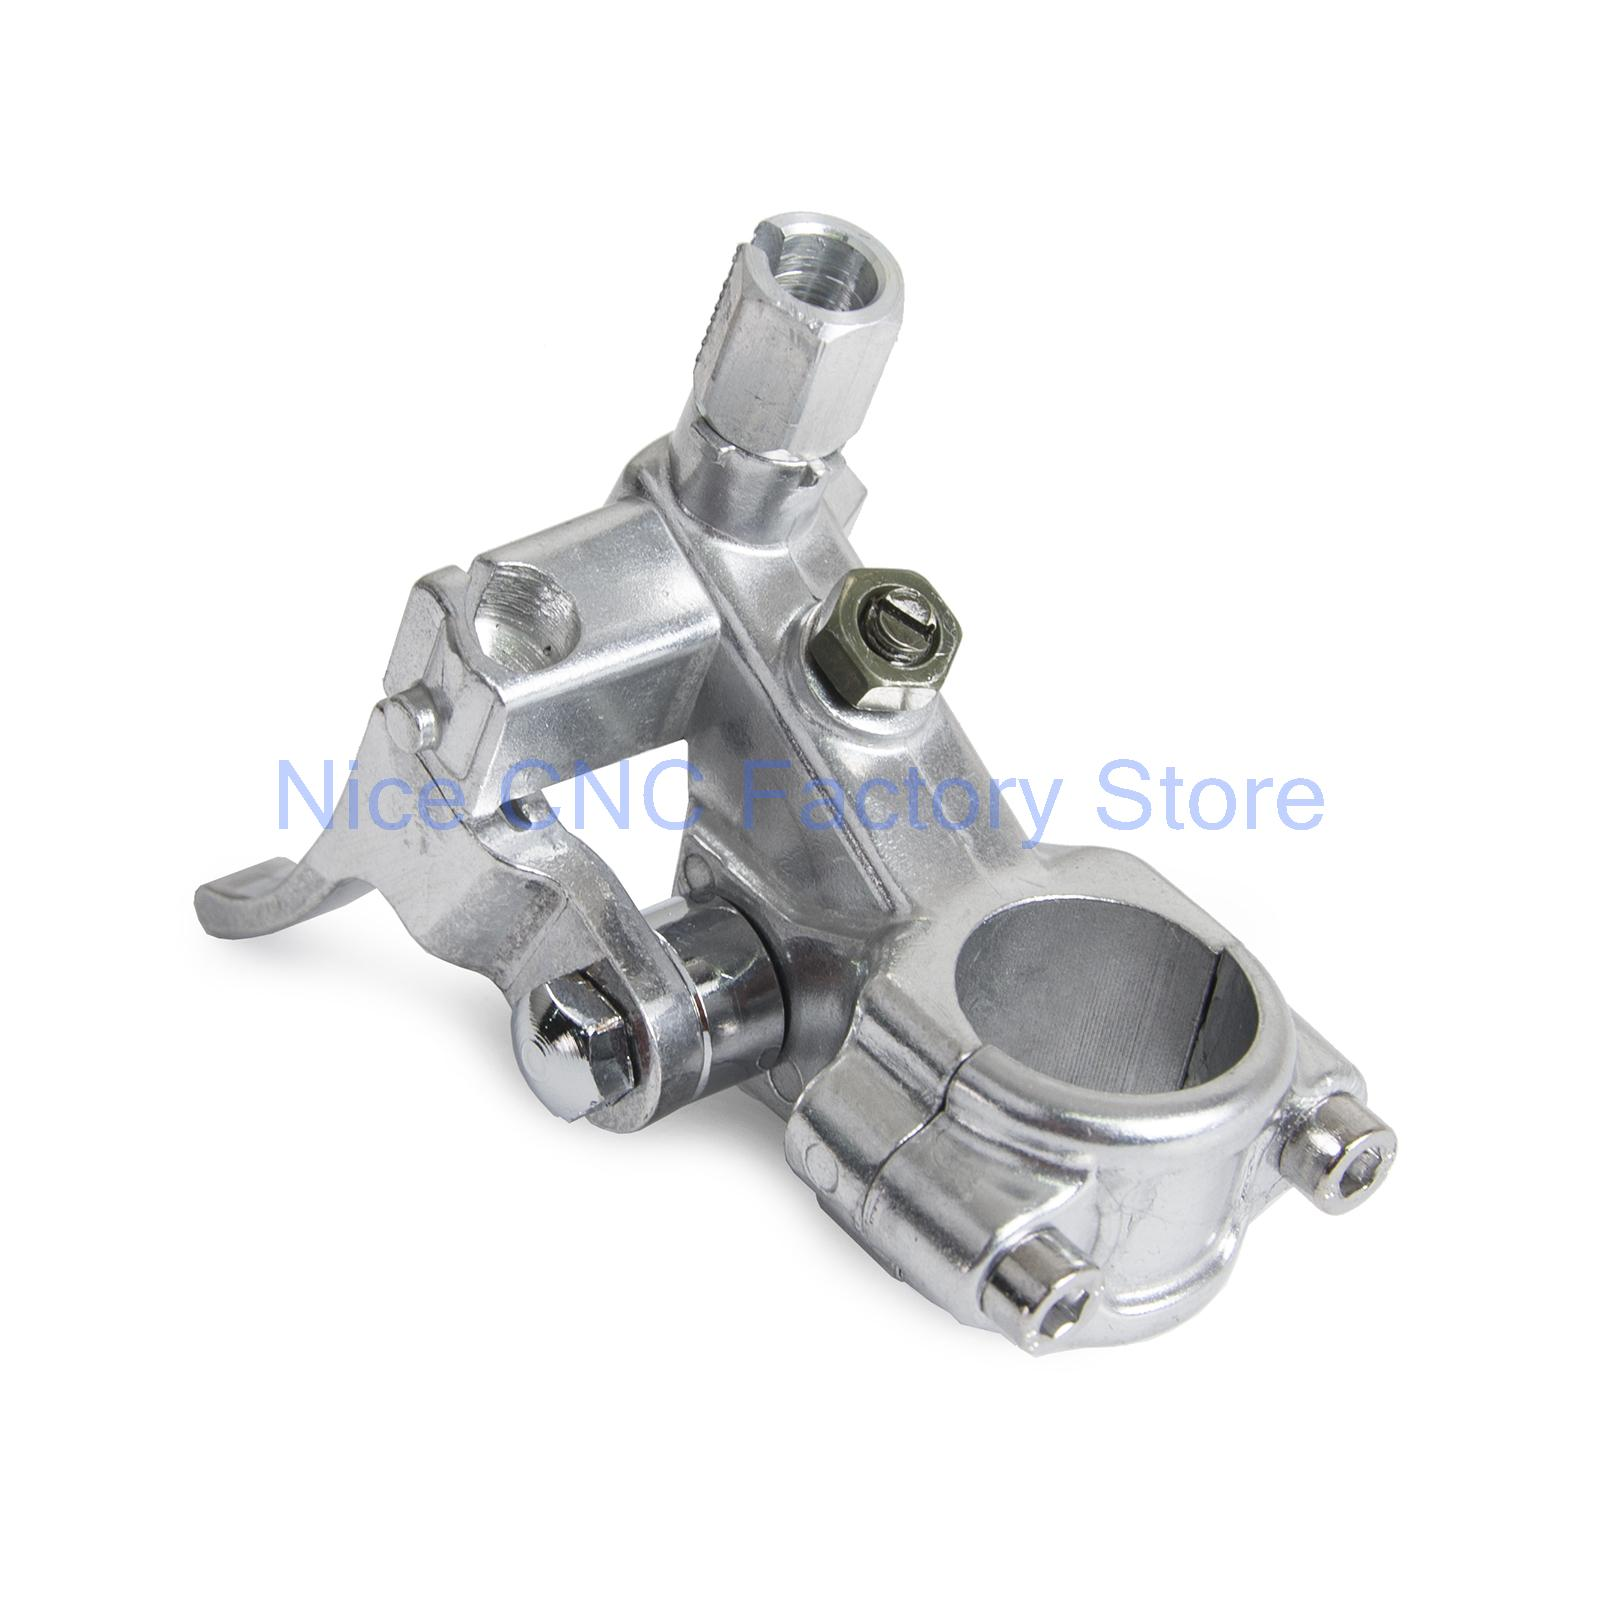 Clutch Lever Bracket For Honda CRF250X 2004-2016 CRF250R 2004-2009 CRF450R 204-2008 CRF450X 2005-2016 CRF250 CRF450 X/R NEW offroad hand lever fit honda crf 250 450 07 12